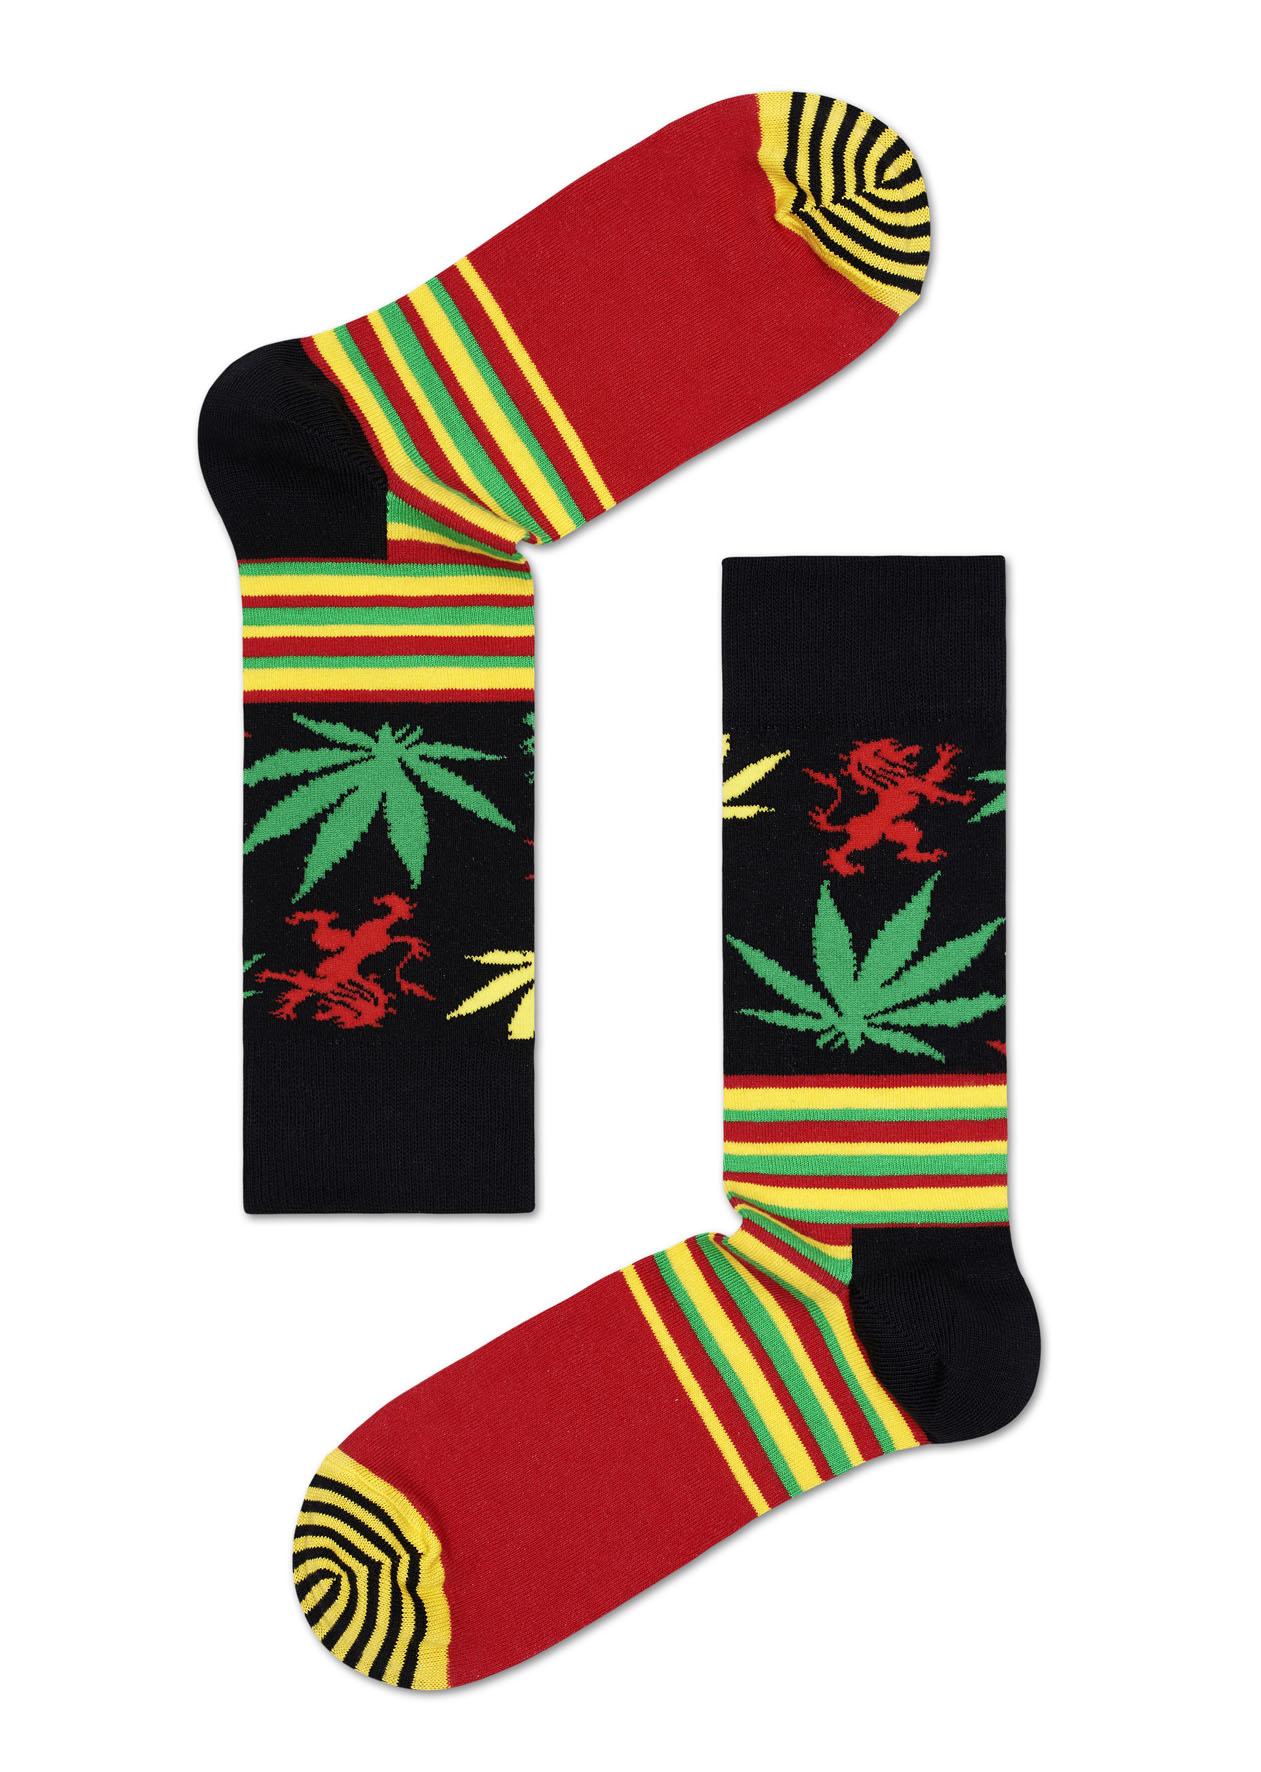 Ponožky Happy Socks Snoop Dogg Stripes & Plants - S-M (36-40)